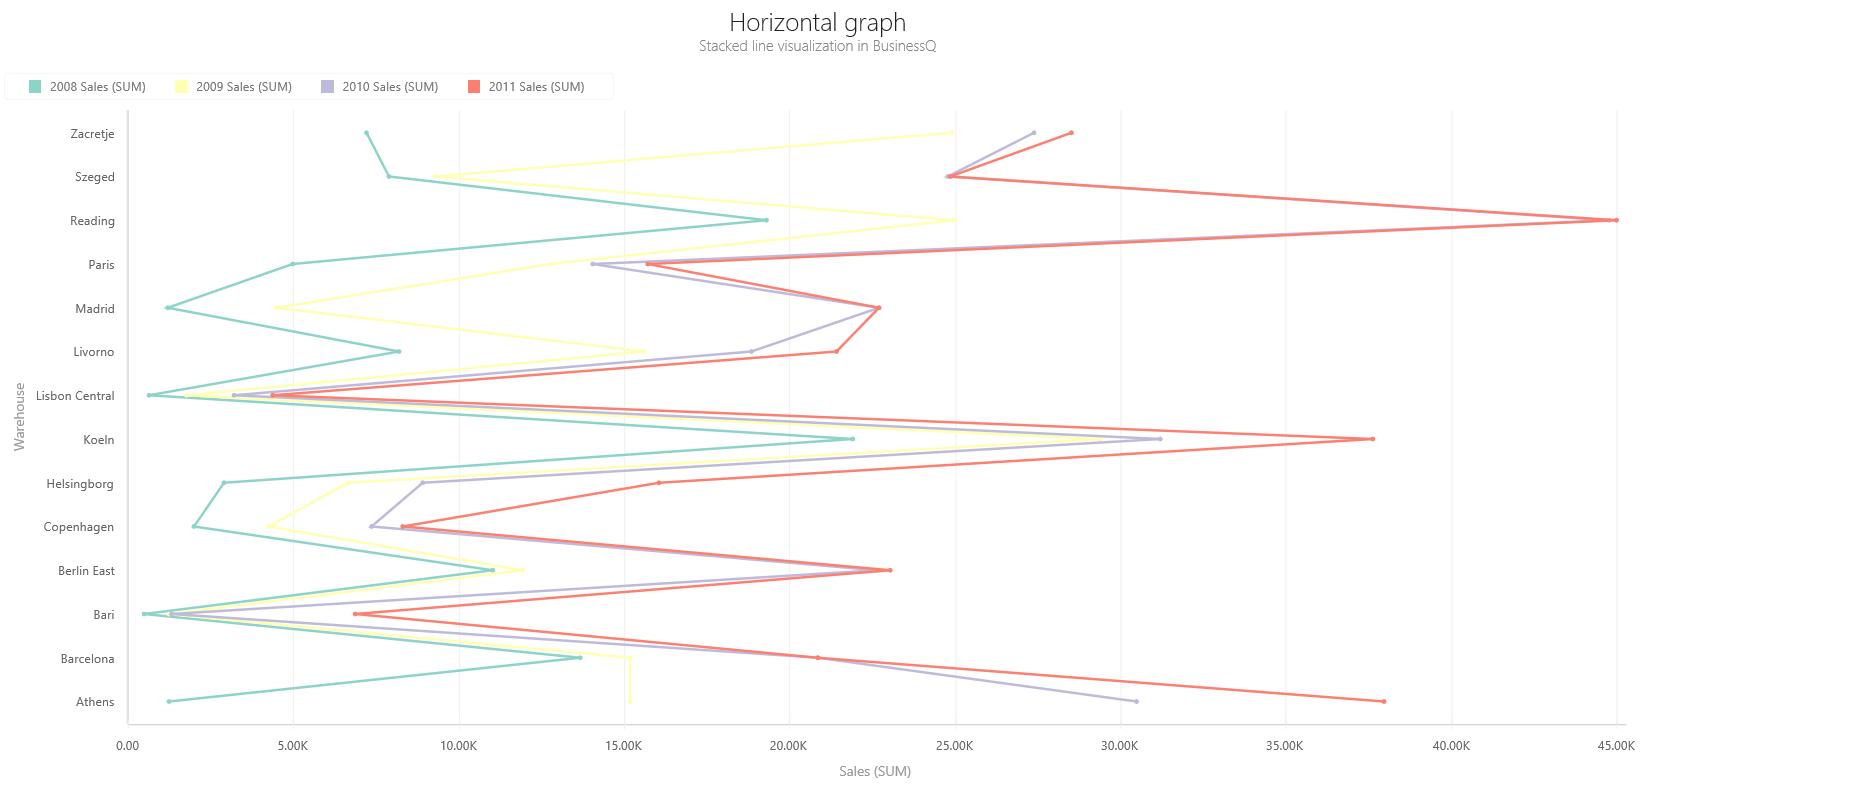 BQ_Horizontal_graph_2_Horizontal_Stacked_Line